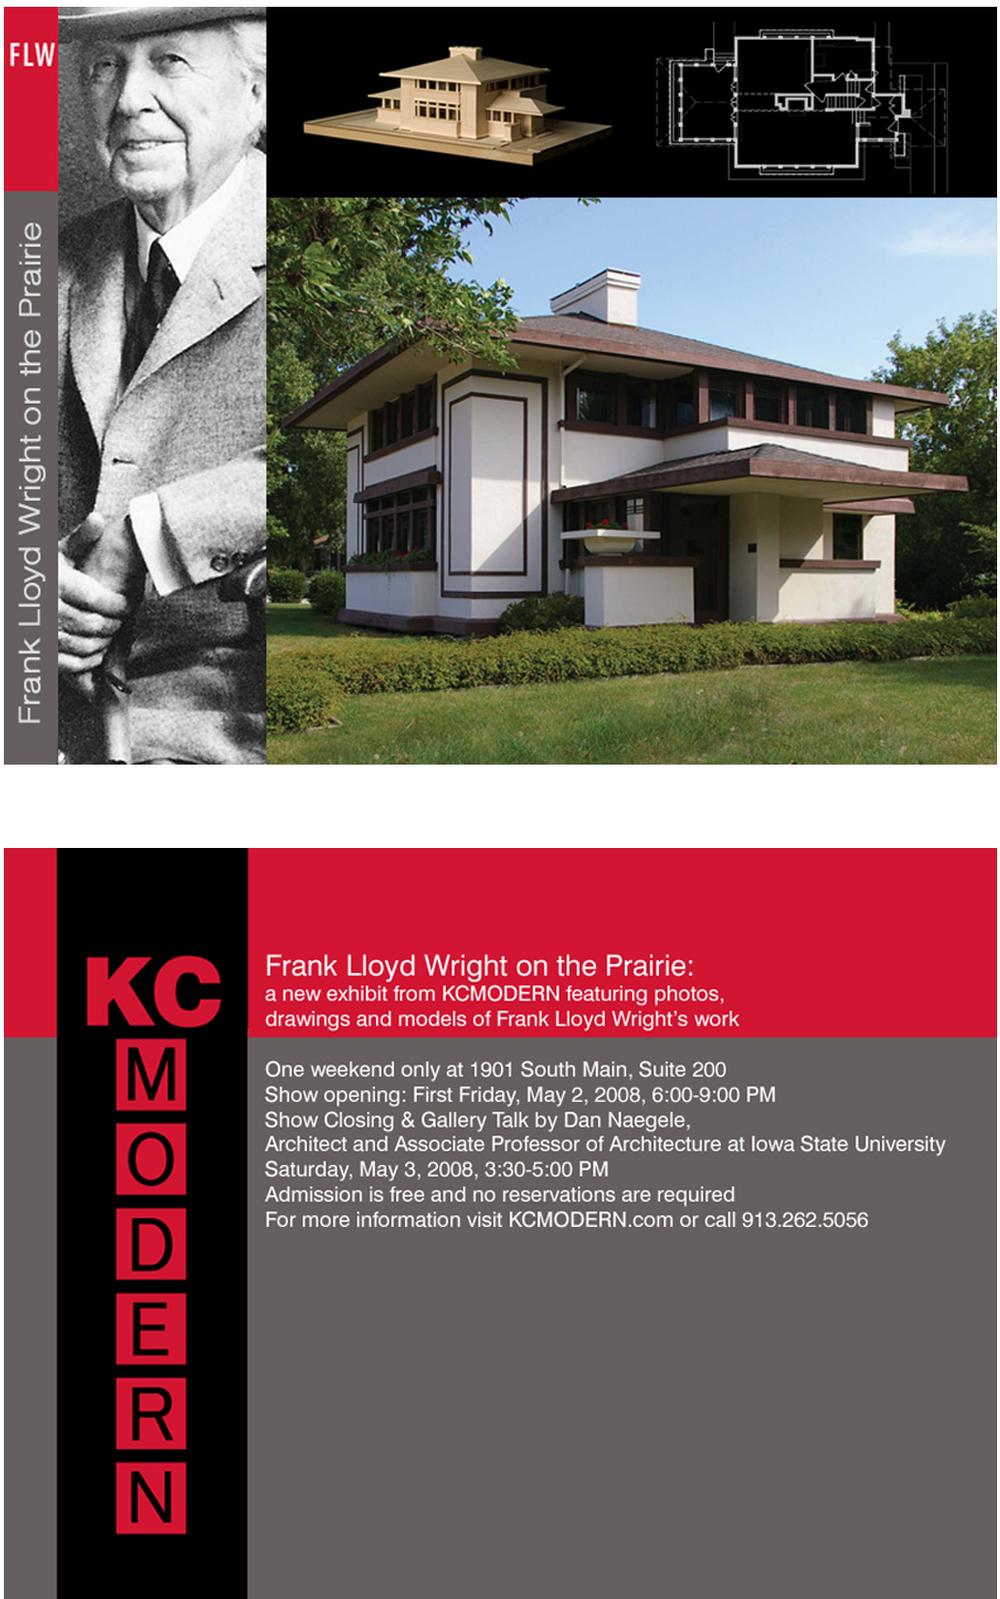 KCmodern Frank Lloyd Wright on the Prairie Invite